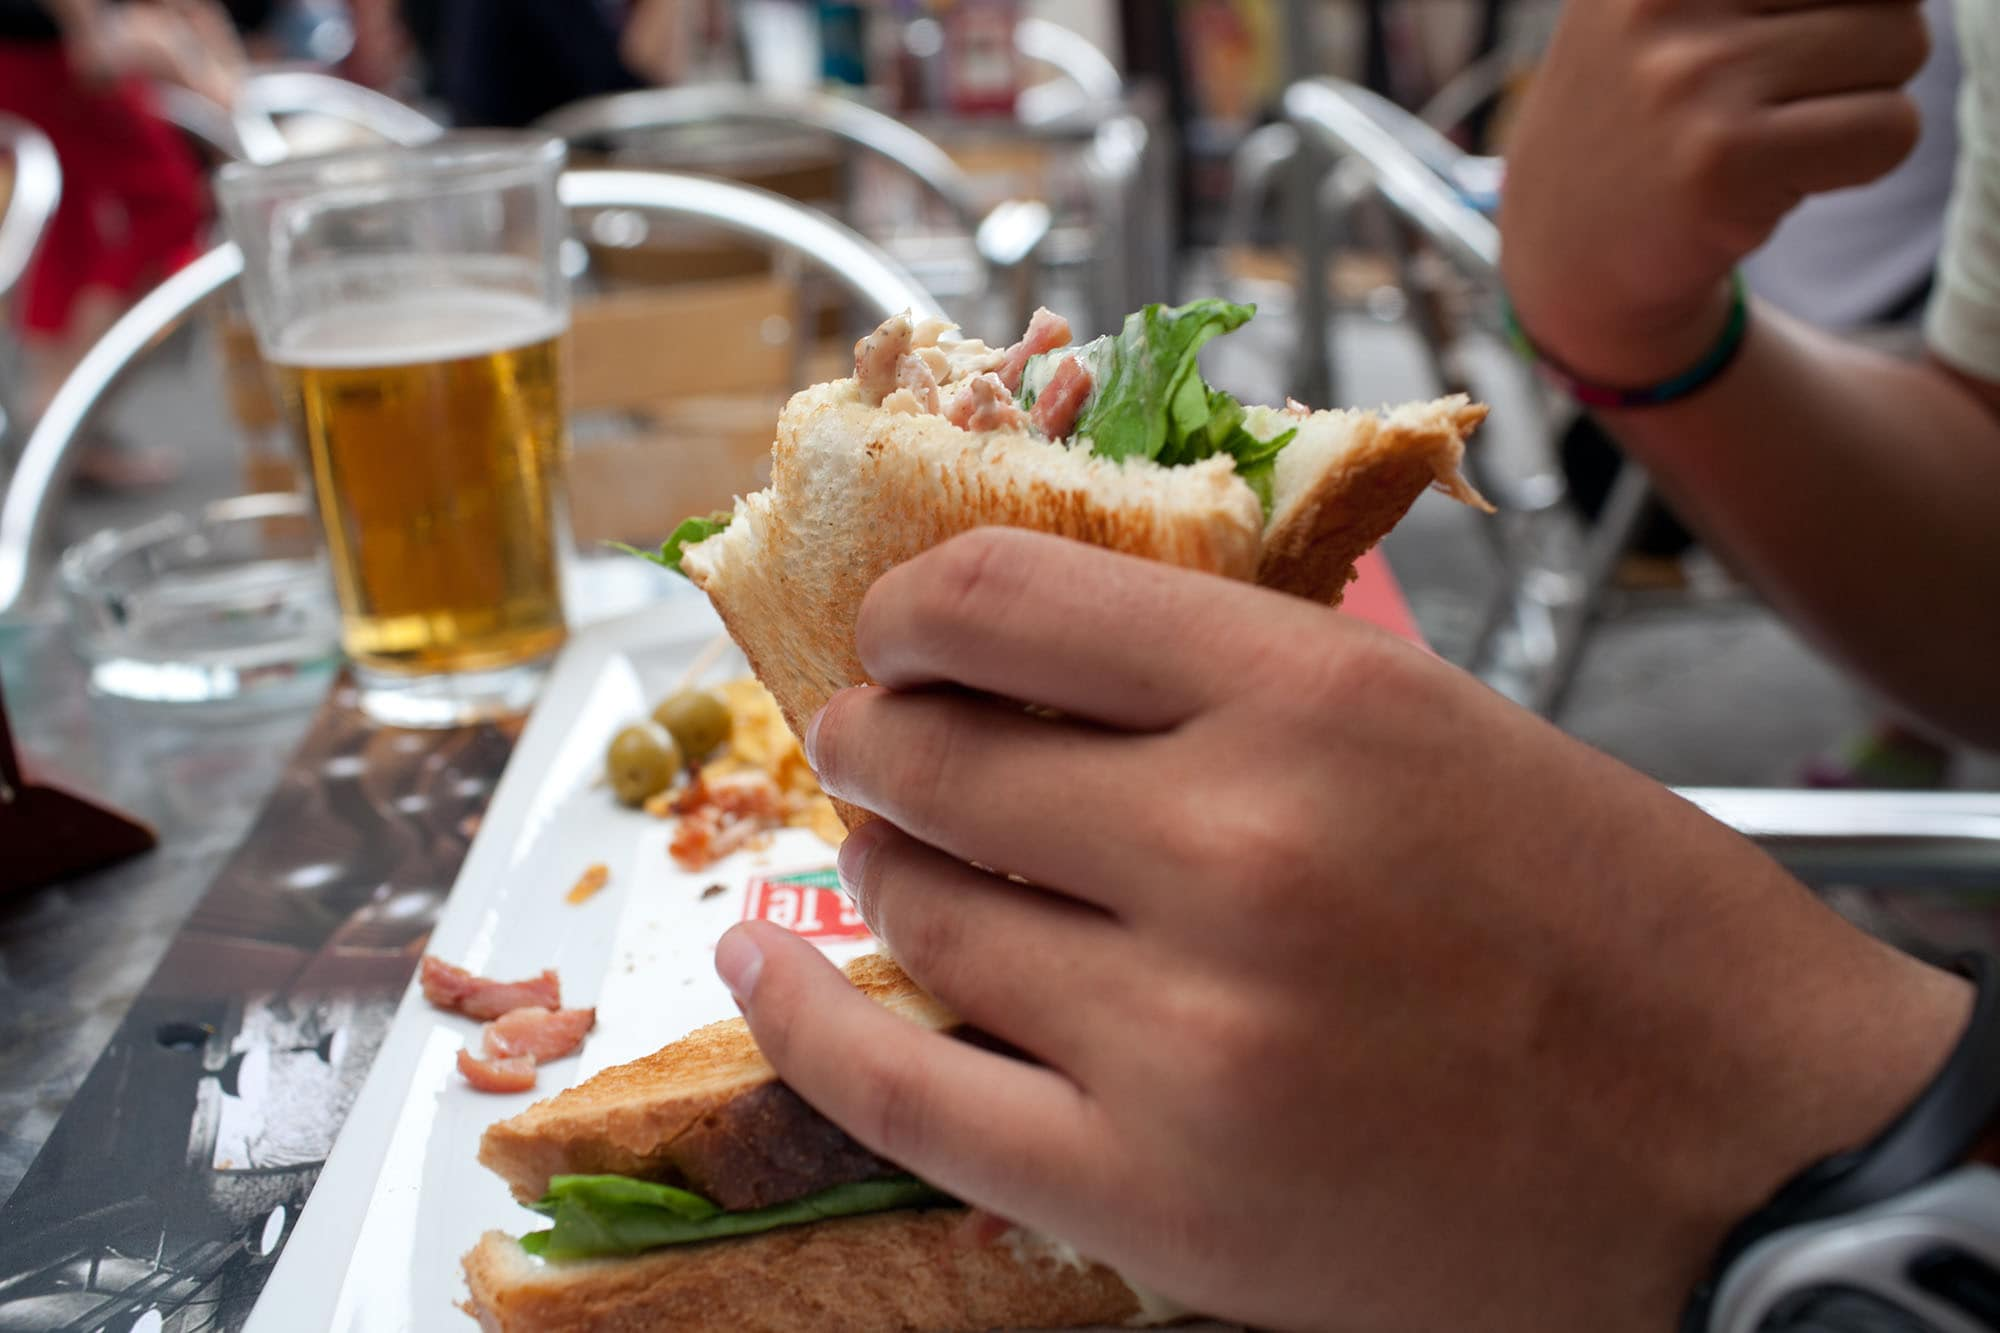 Jaime eats a sandwich in Valencia, Spain.